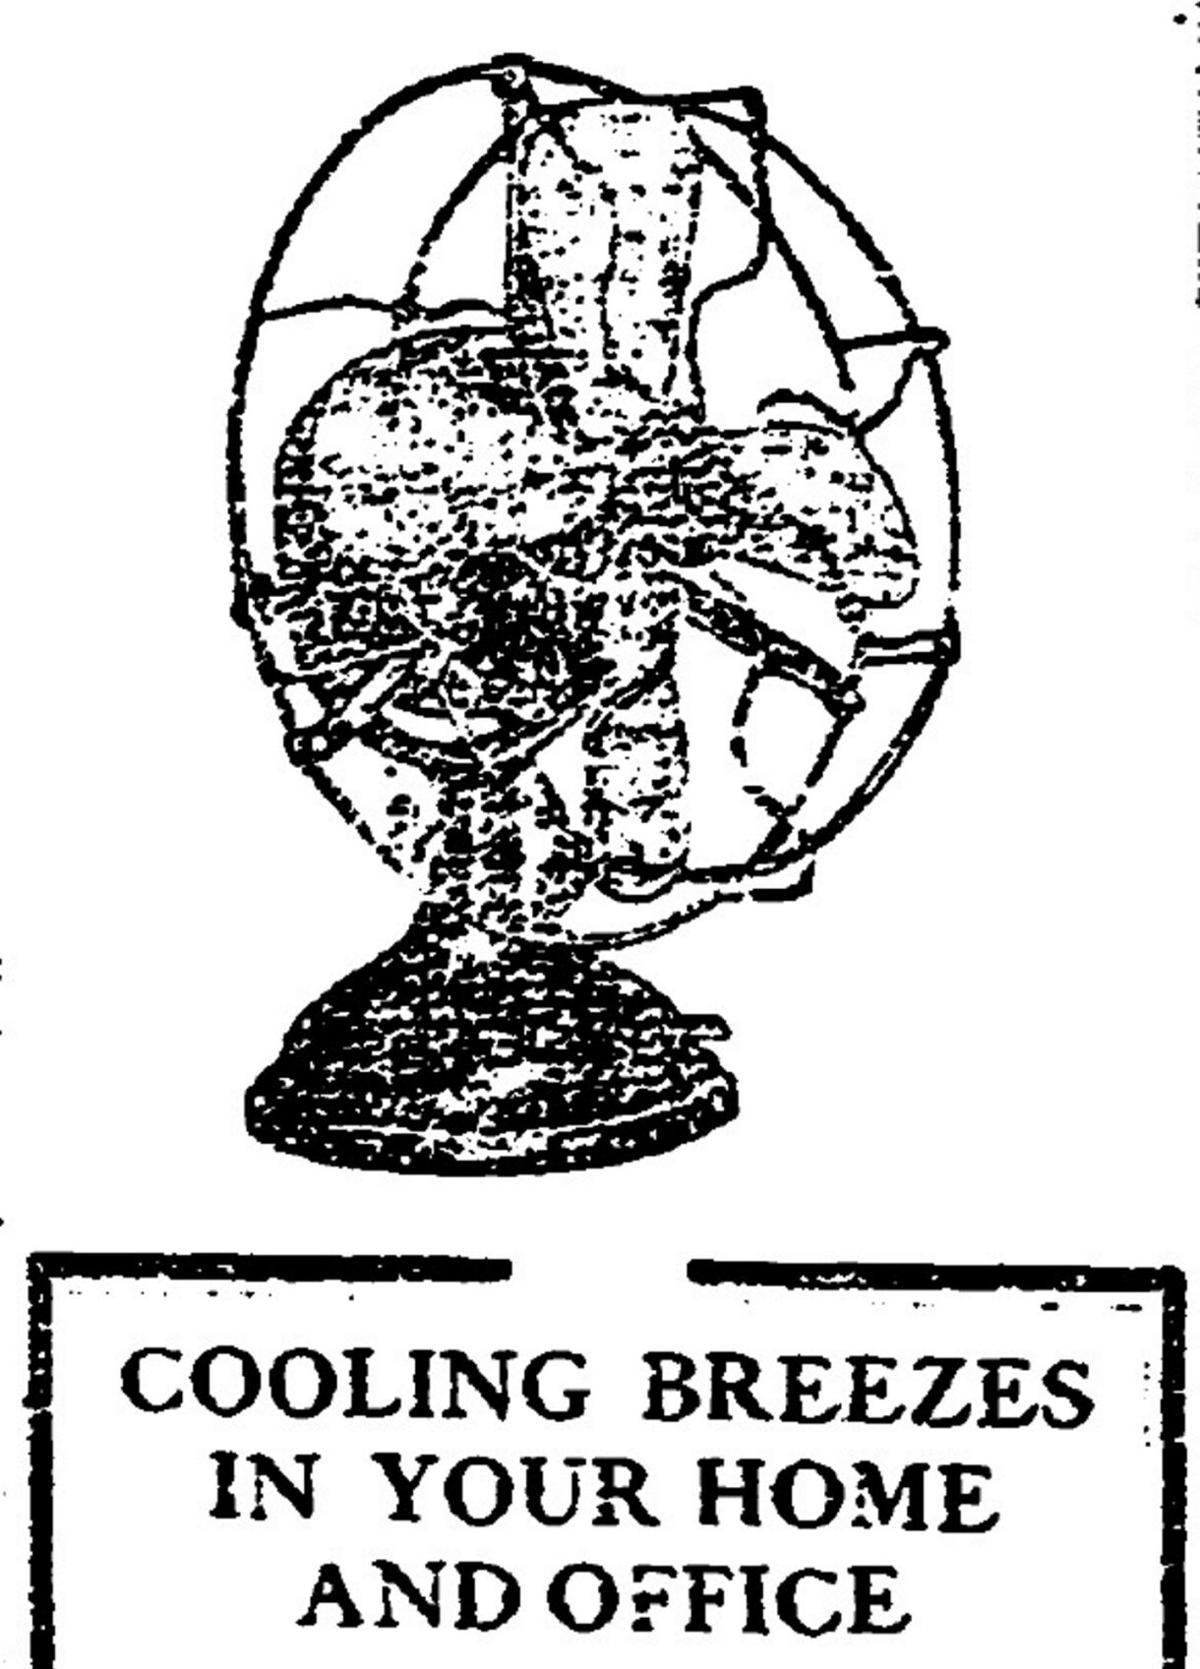 A July 1911 Watertown Light & Power Co. advertisement